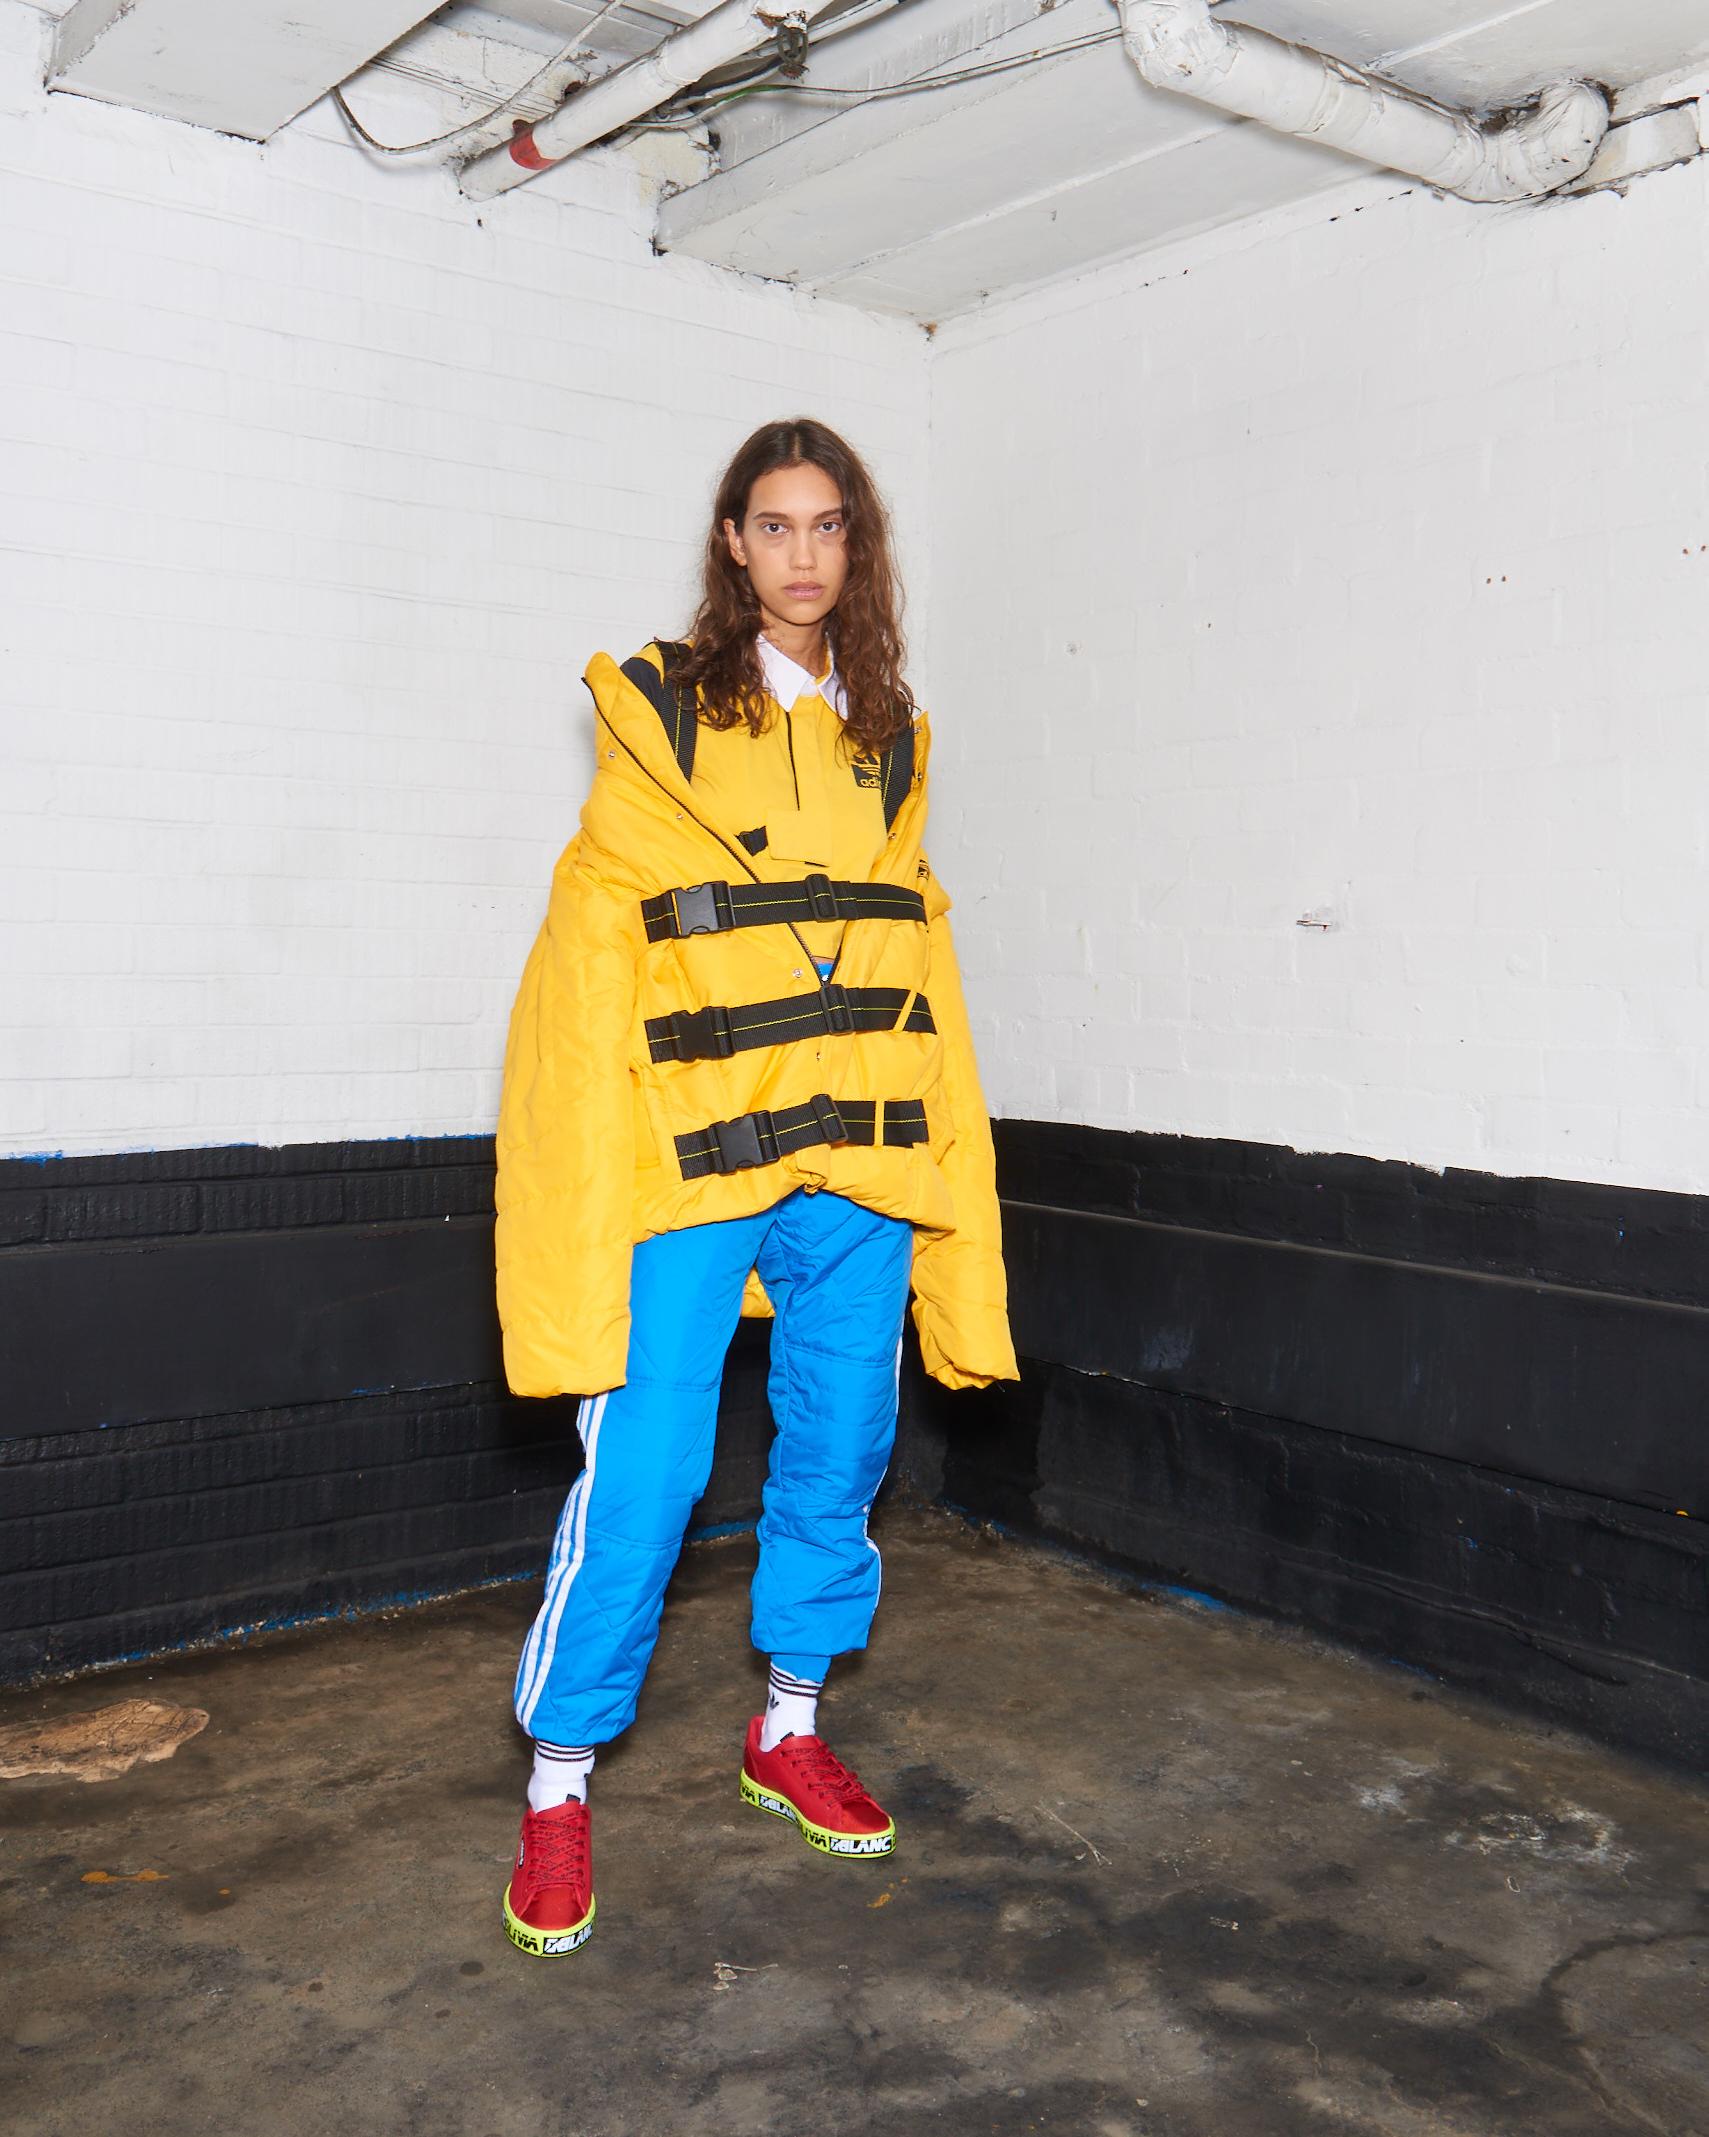 x Olivia Oblanc Adidas Originals x Adidas Originals Oblanc Originals Adidas Olivia x I9EHDW2